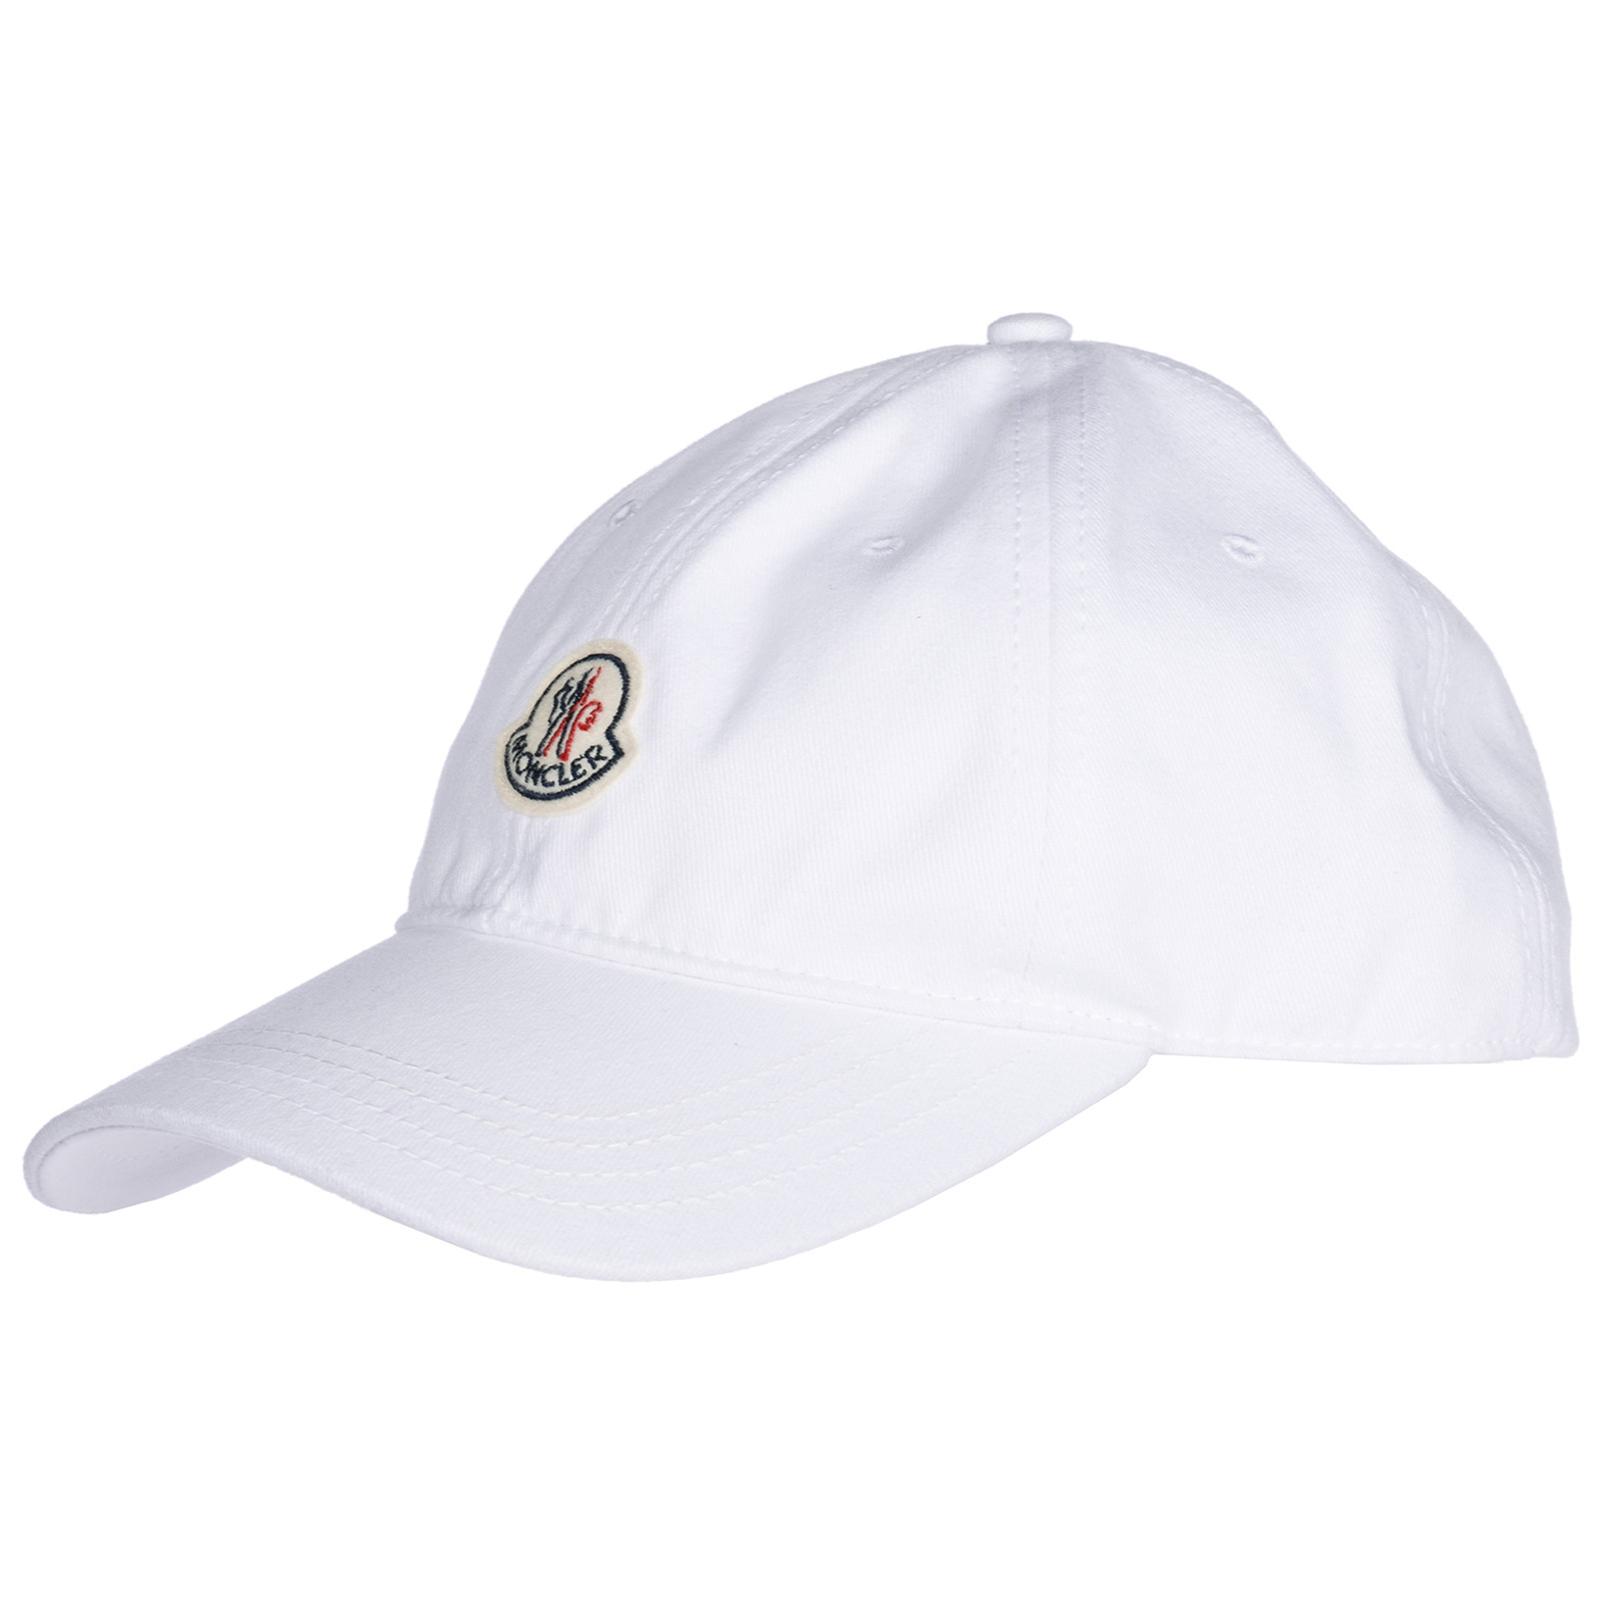 657a3509a2b Moncler Adjustable Men s Cotton Hat Baseball Cap In White